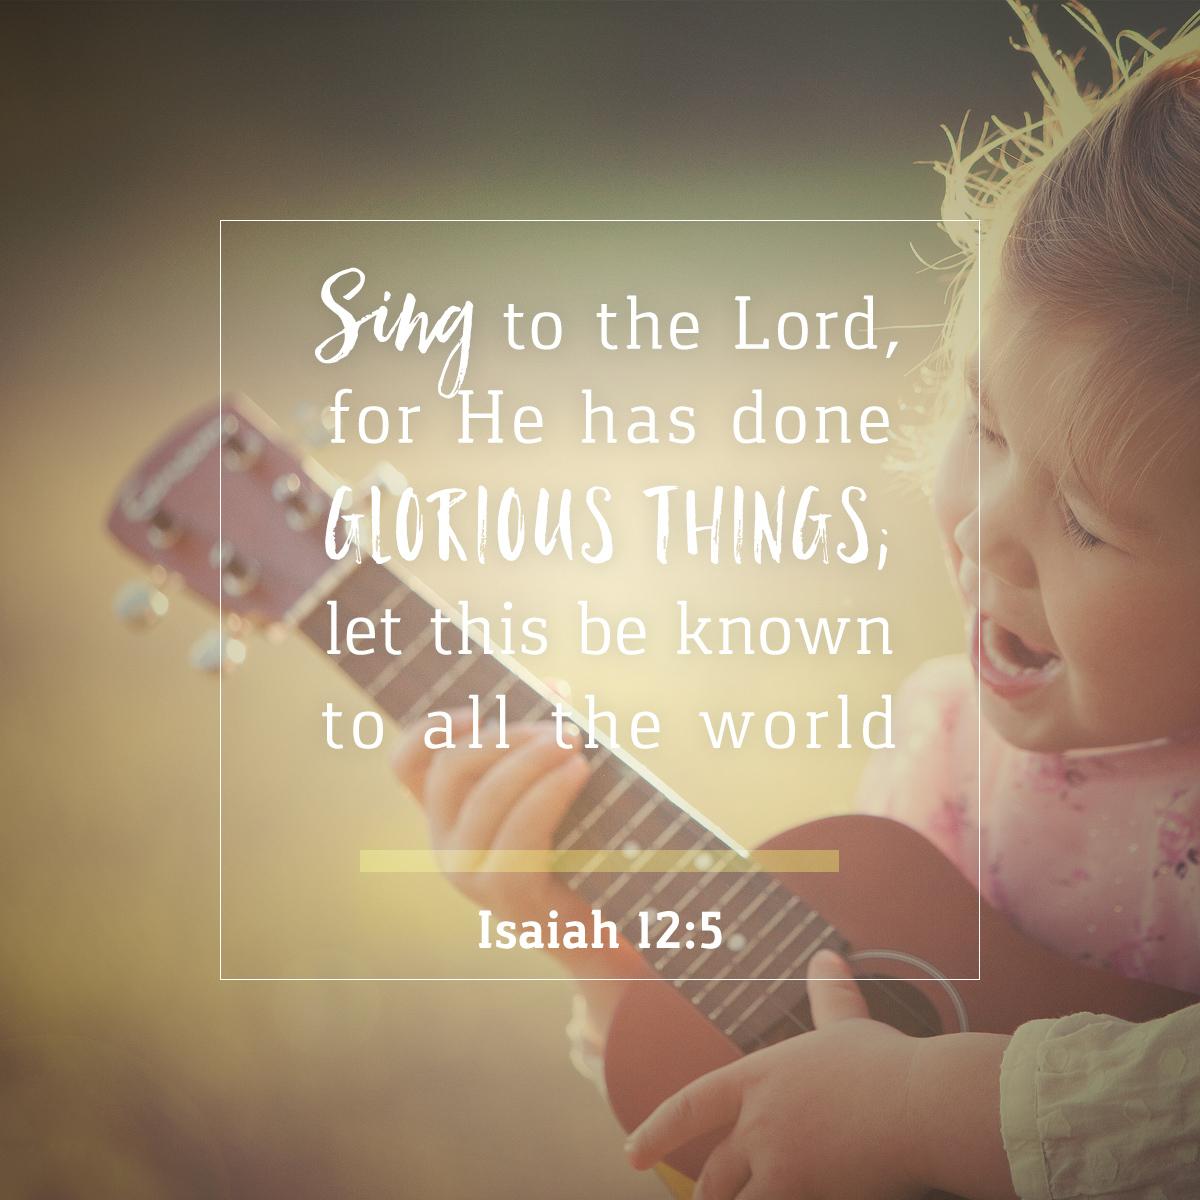 Isaiah 12:5